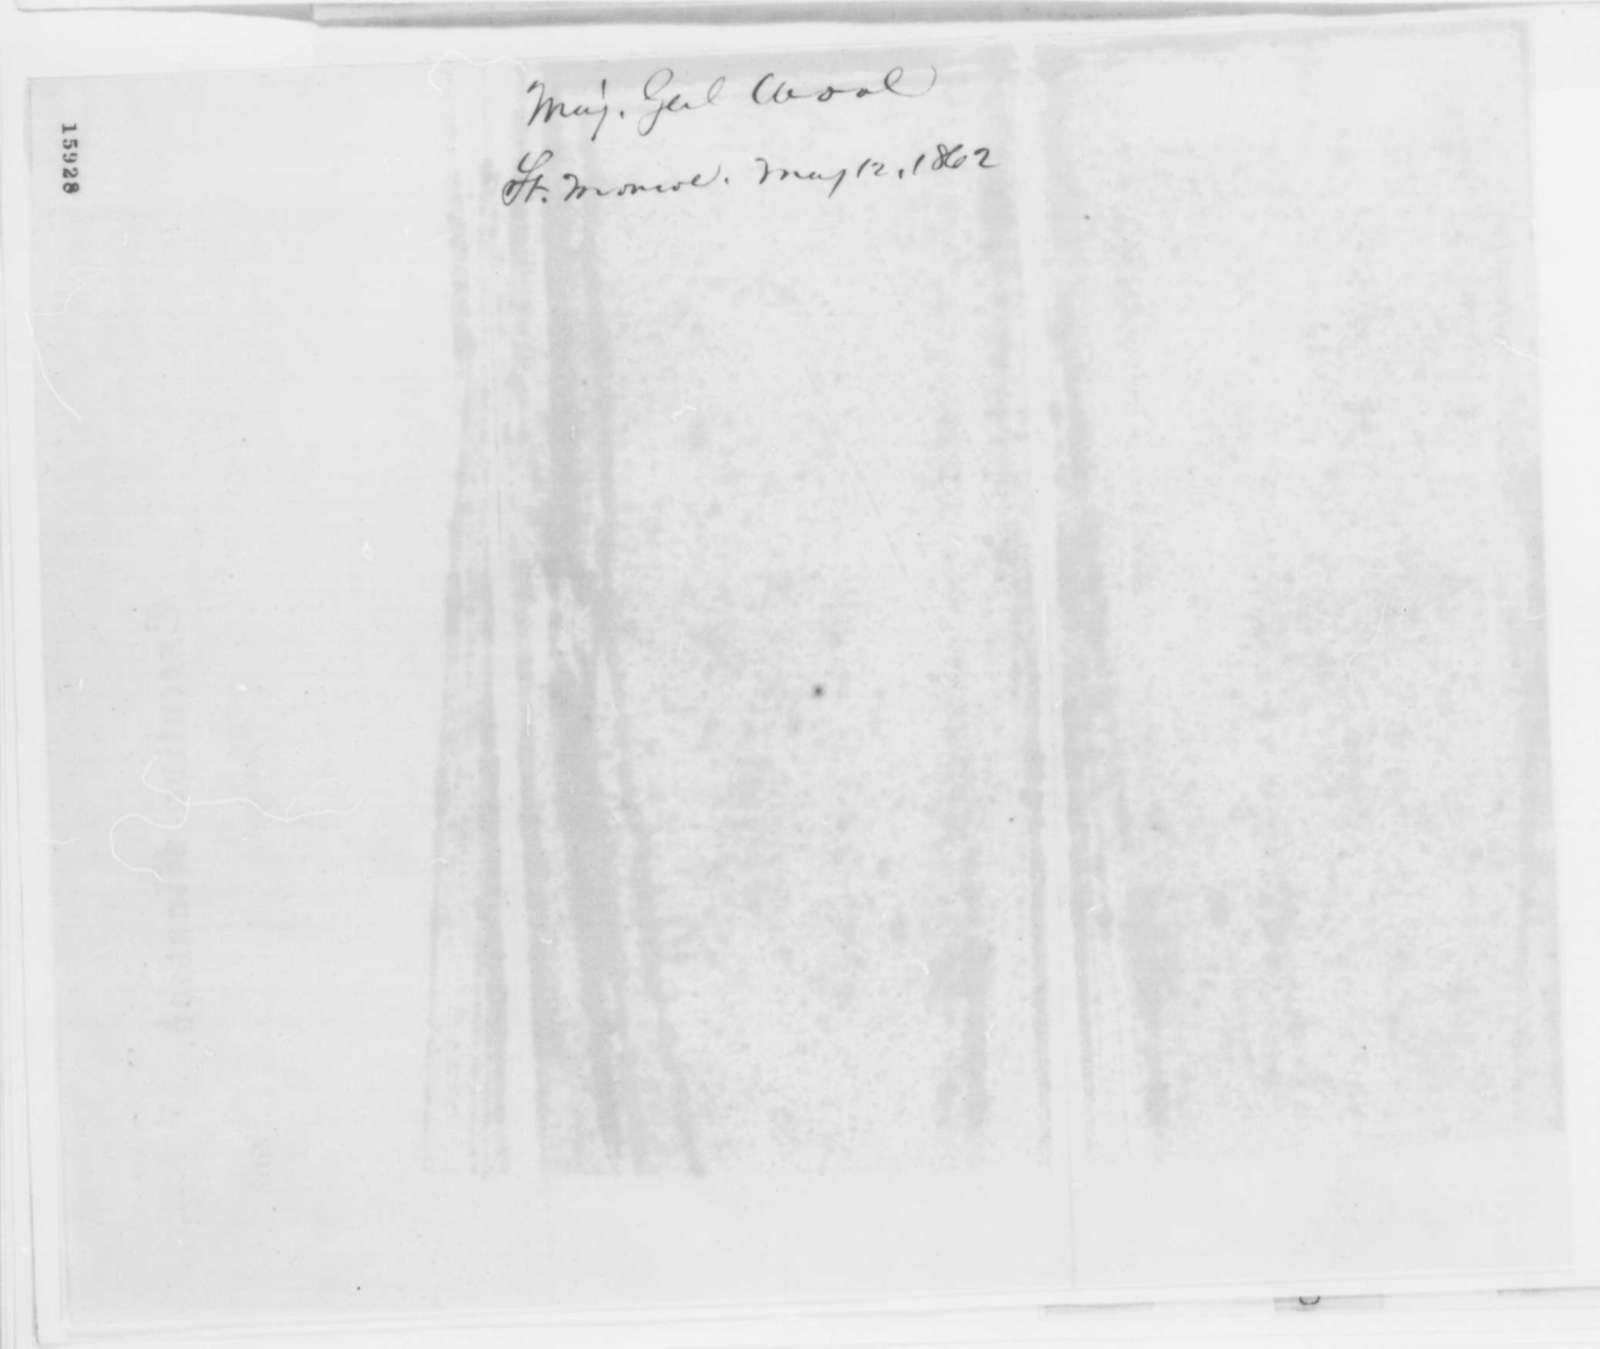 John E. Wool to Edwin M. Stanton, Monday, May 12, 1862  (Telegram regarding military affairs)